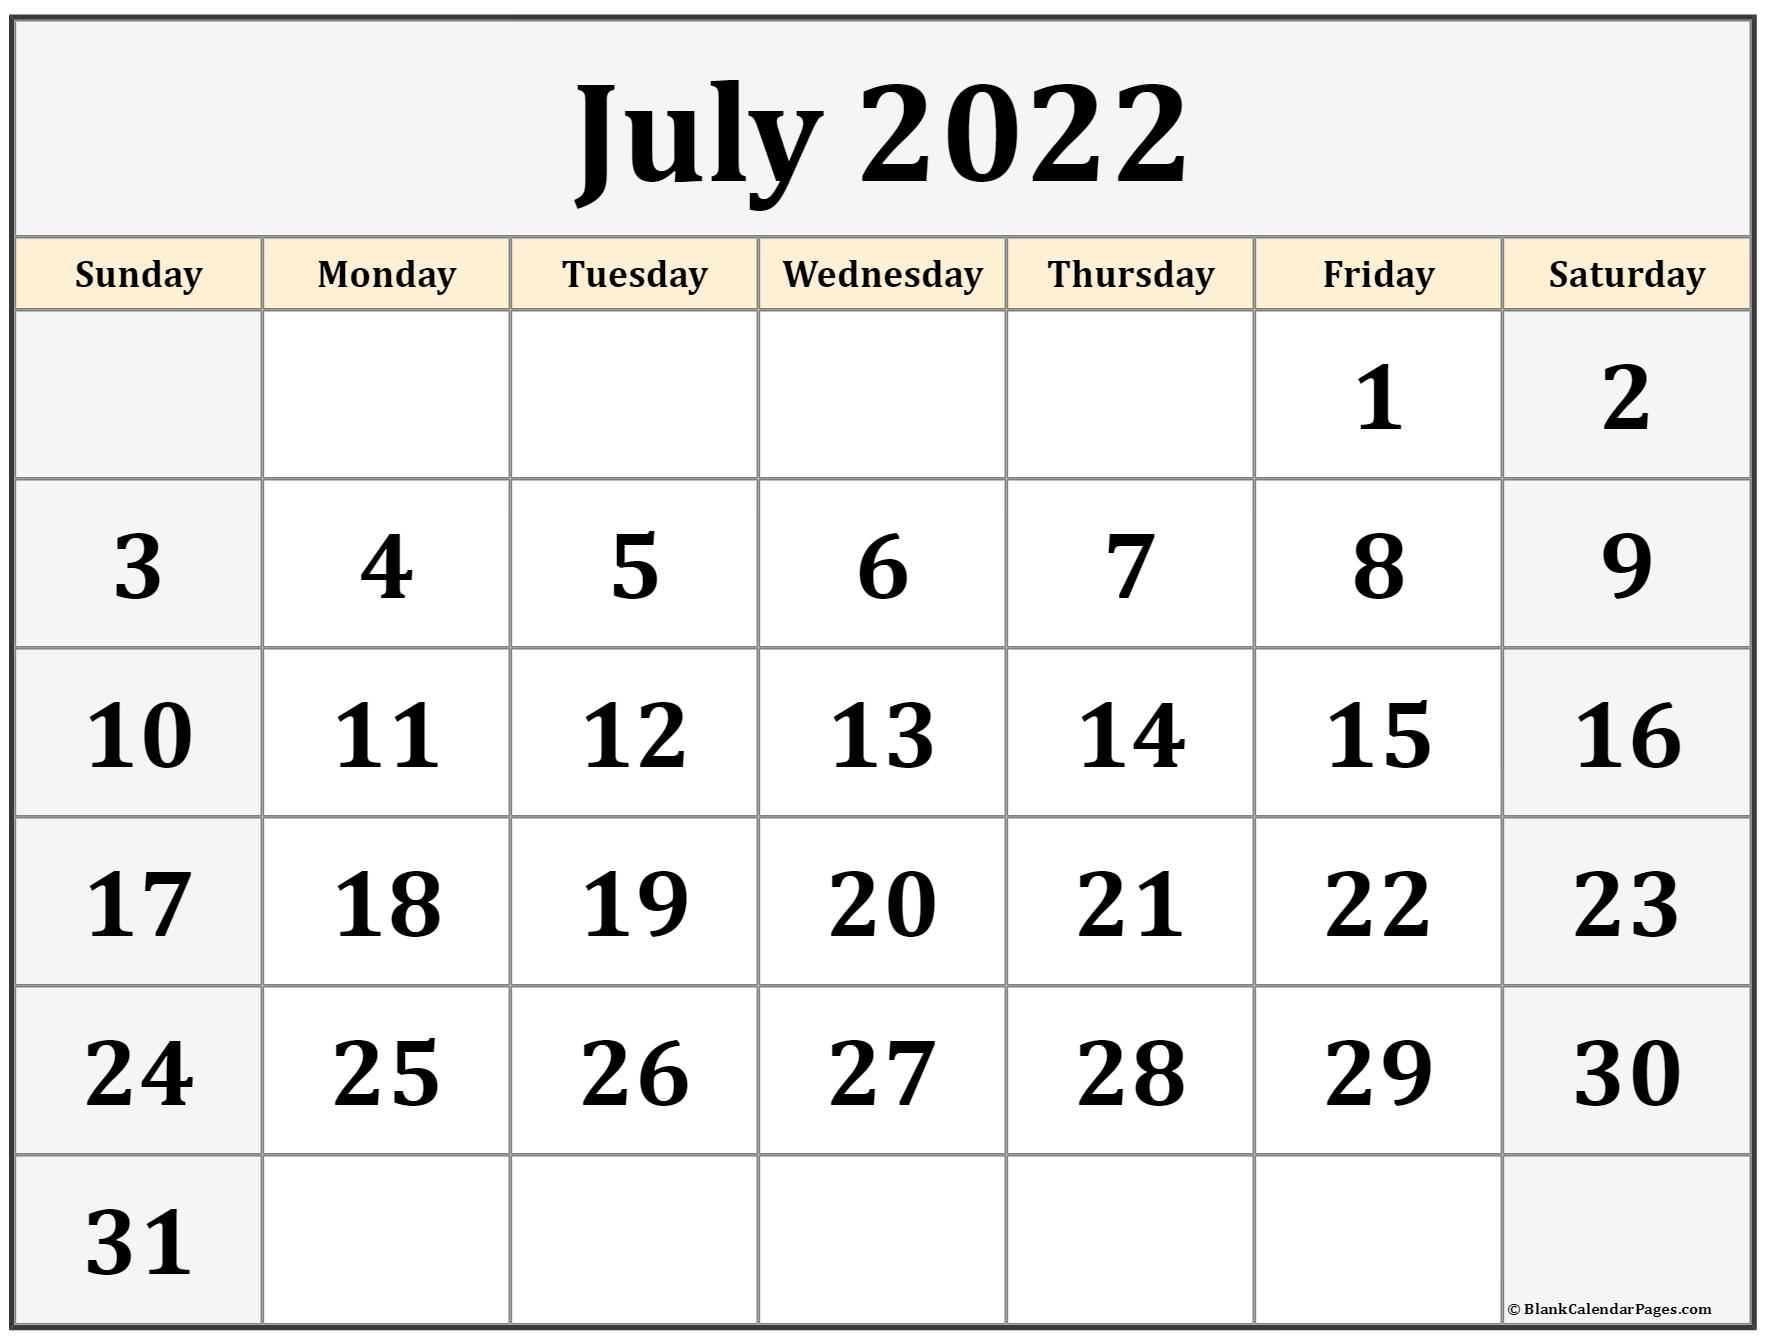 July 2022 calendar | free printable monthly calendars